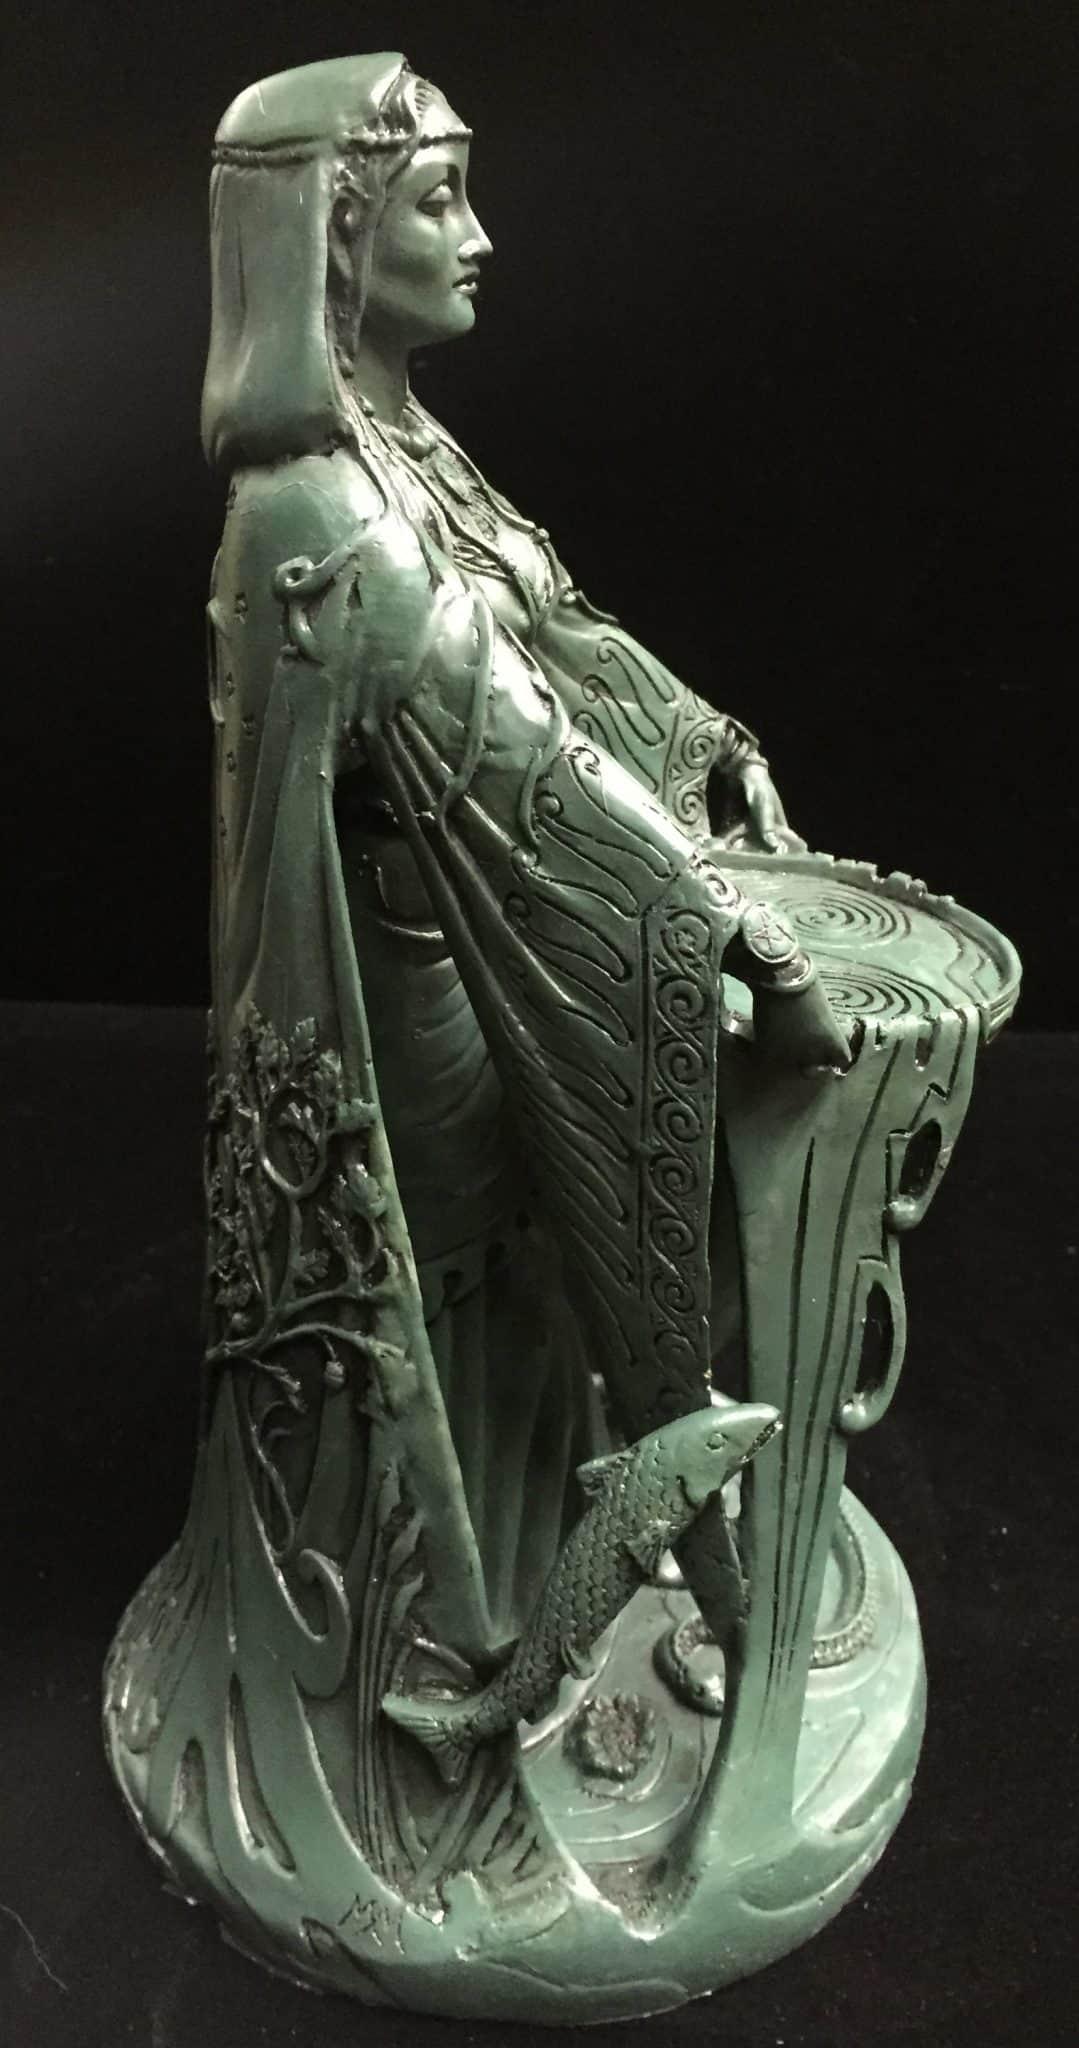 Celtic Goddess Danu Green Bronze Resin Statue by Maxine Miller ©Maxine Miller - Side View